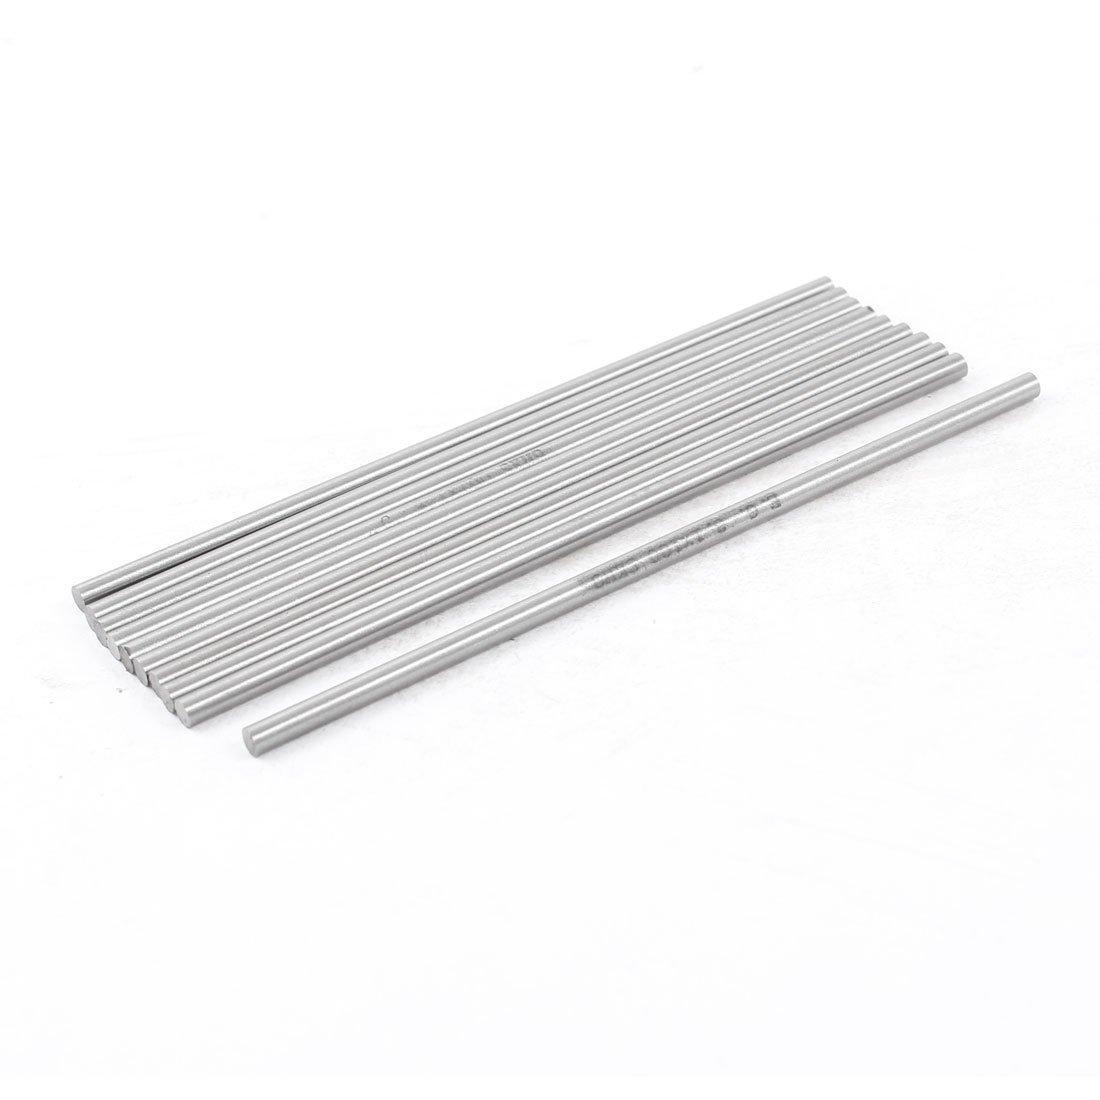 10 PCS 3.1mm Diameter 100mm Long Boring Tool Round Turning Lathe Bars DealMux DLM-B00MJSI3XW